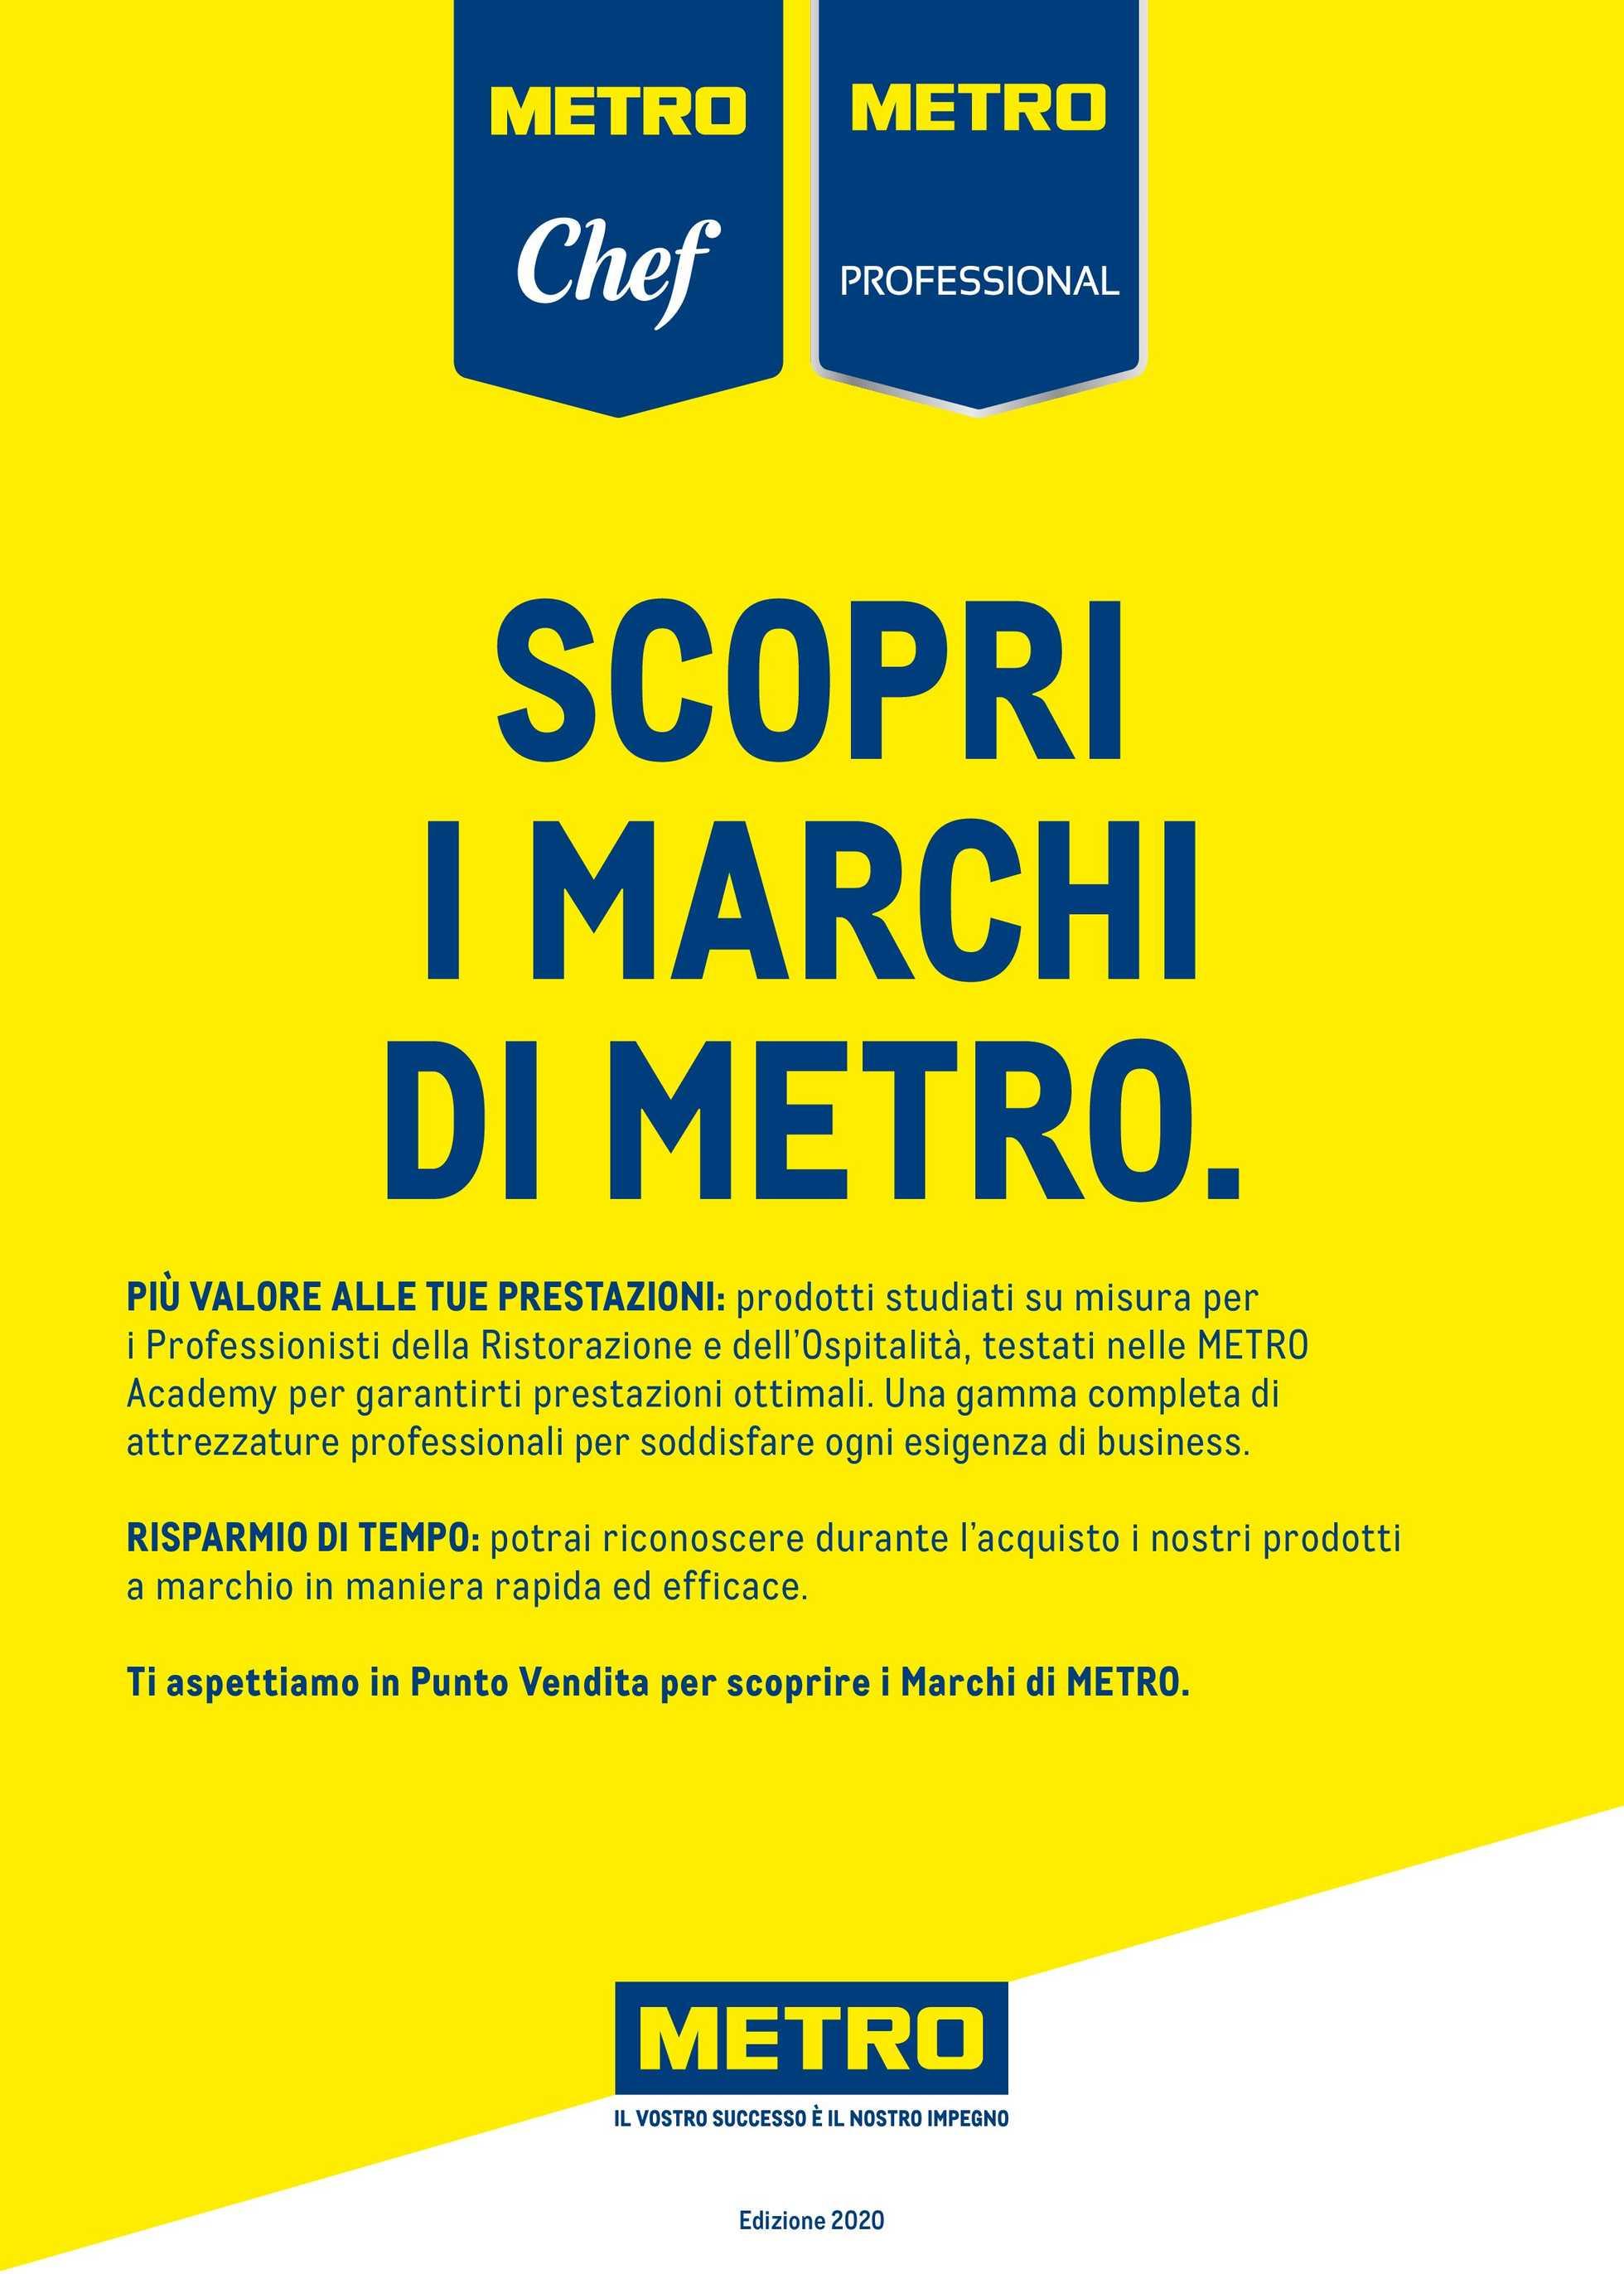 Metro - offerte valide dal 02.03.2020 al 31.12.2020 - pagina 4.